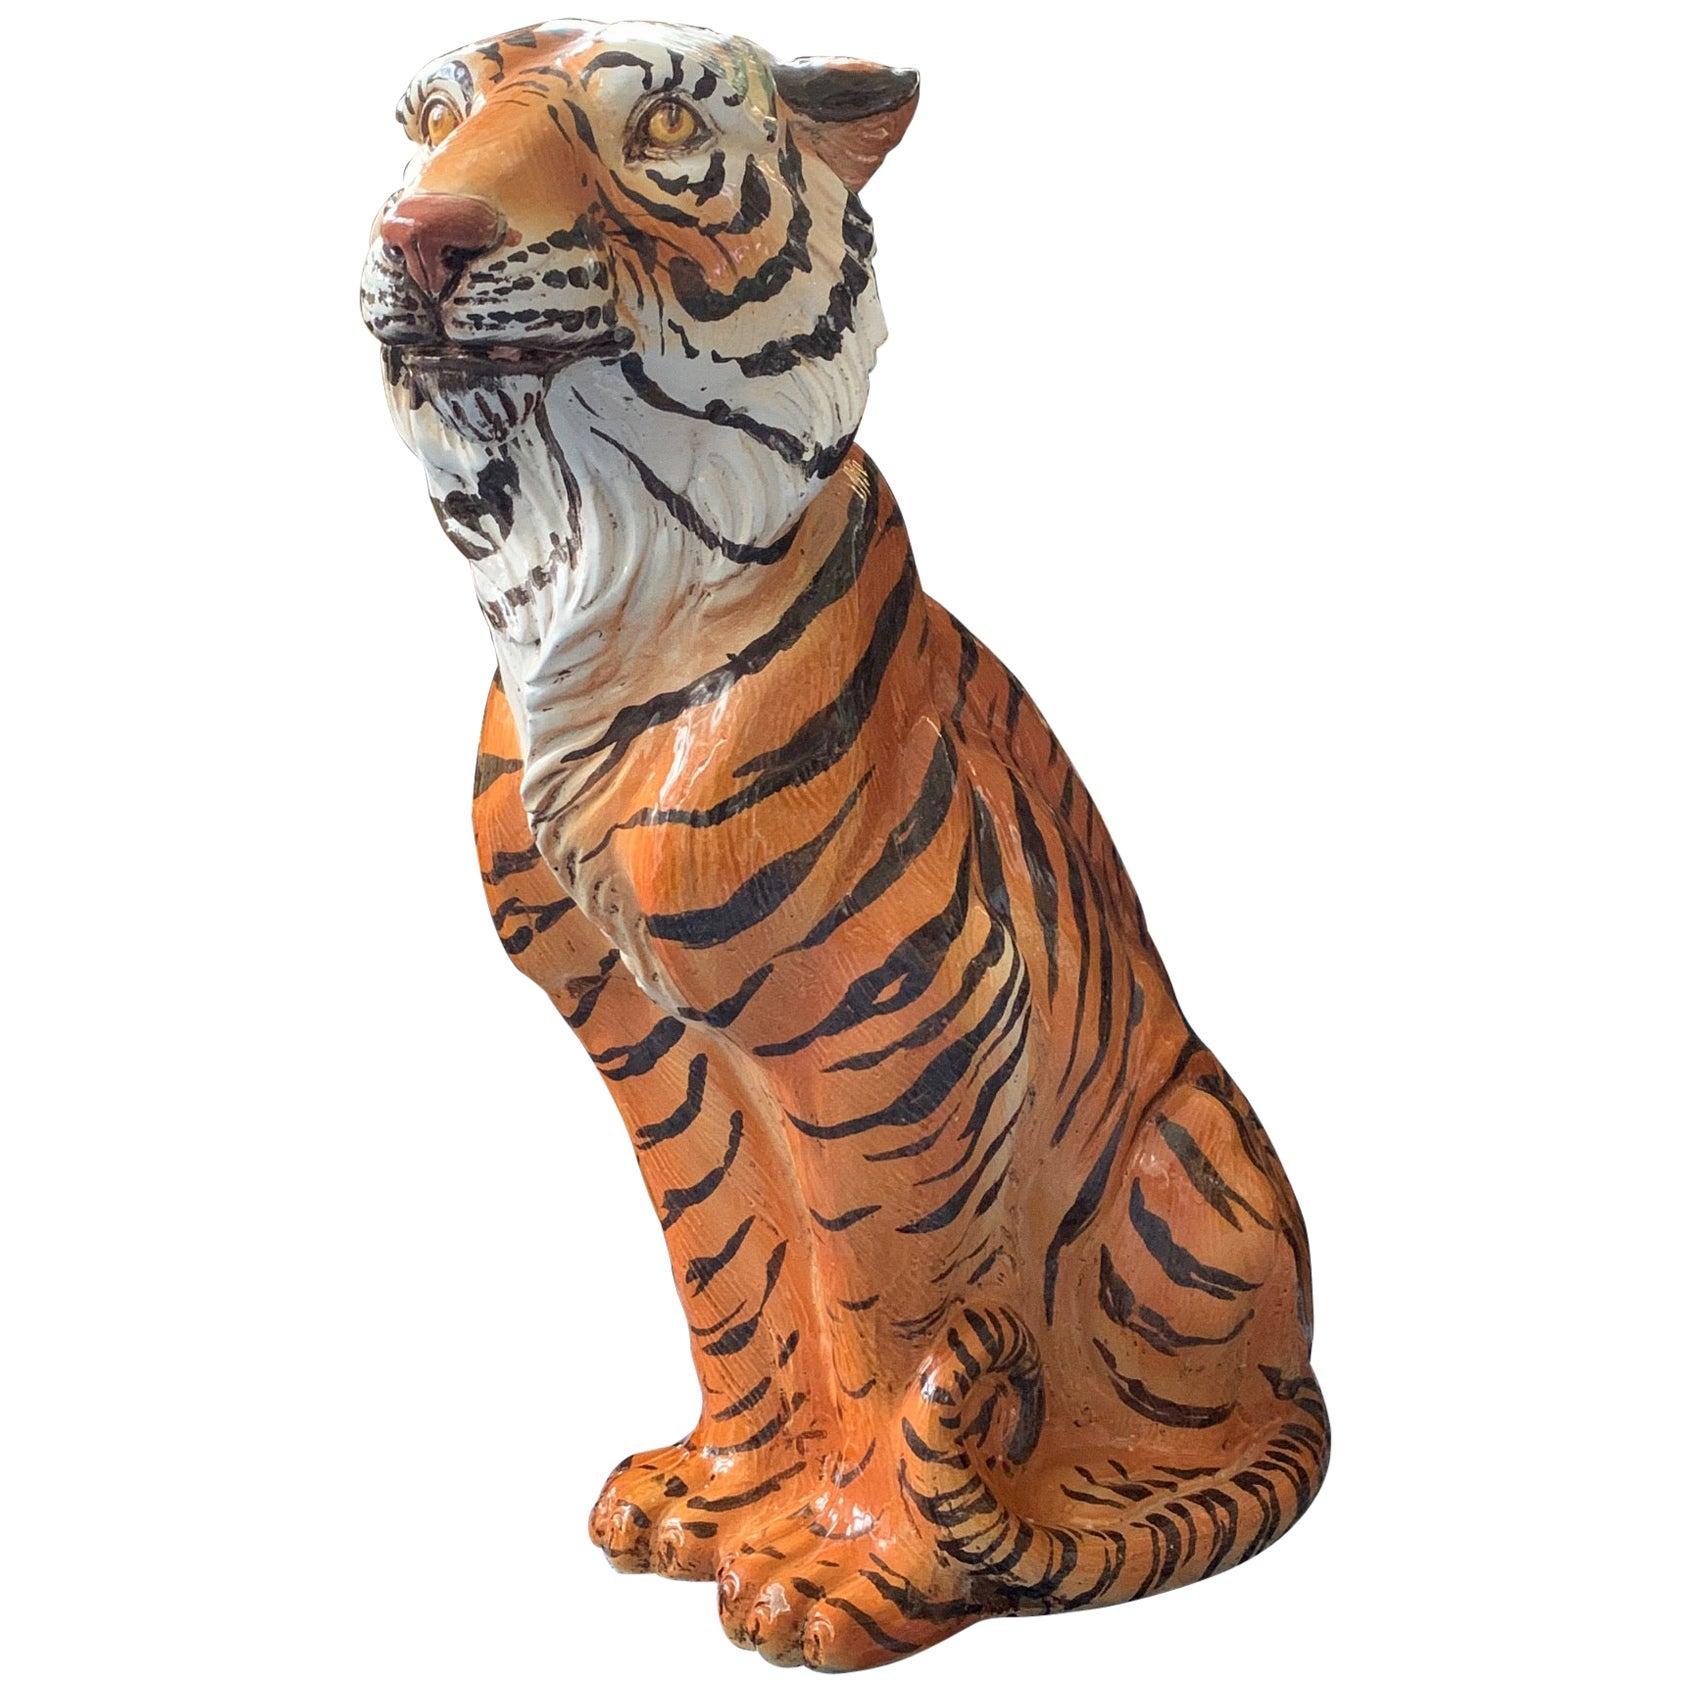 Large Midcentury Glazed Ceramic Tiger Statue